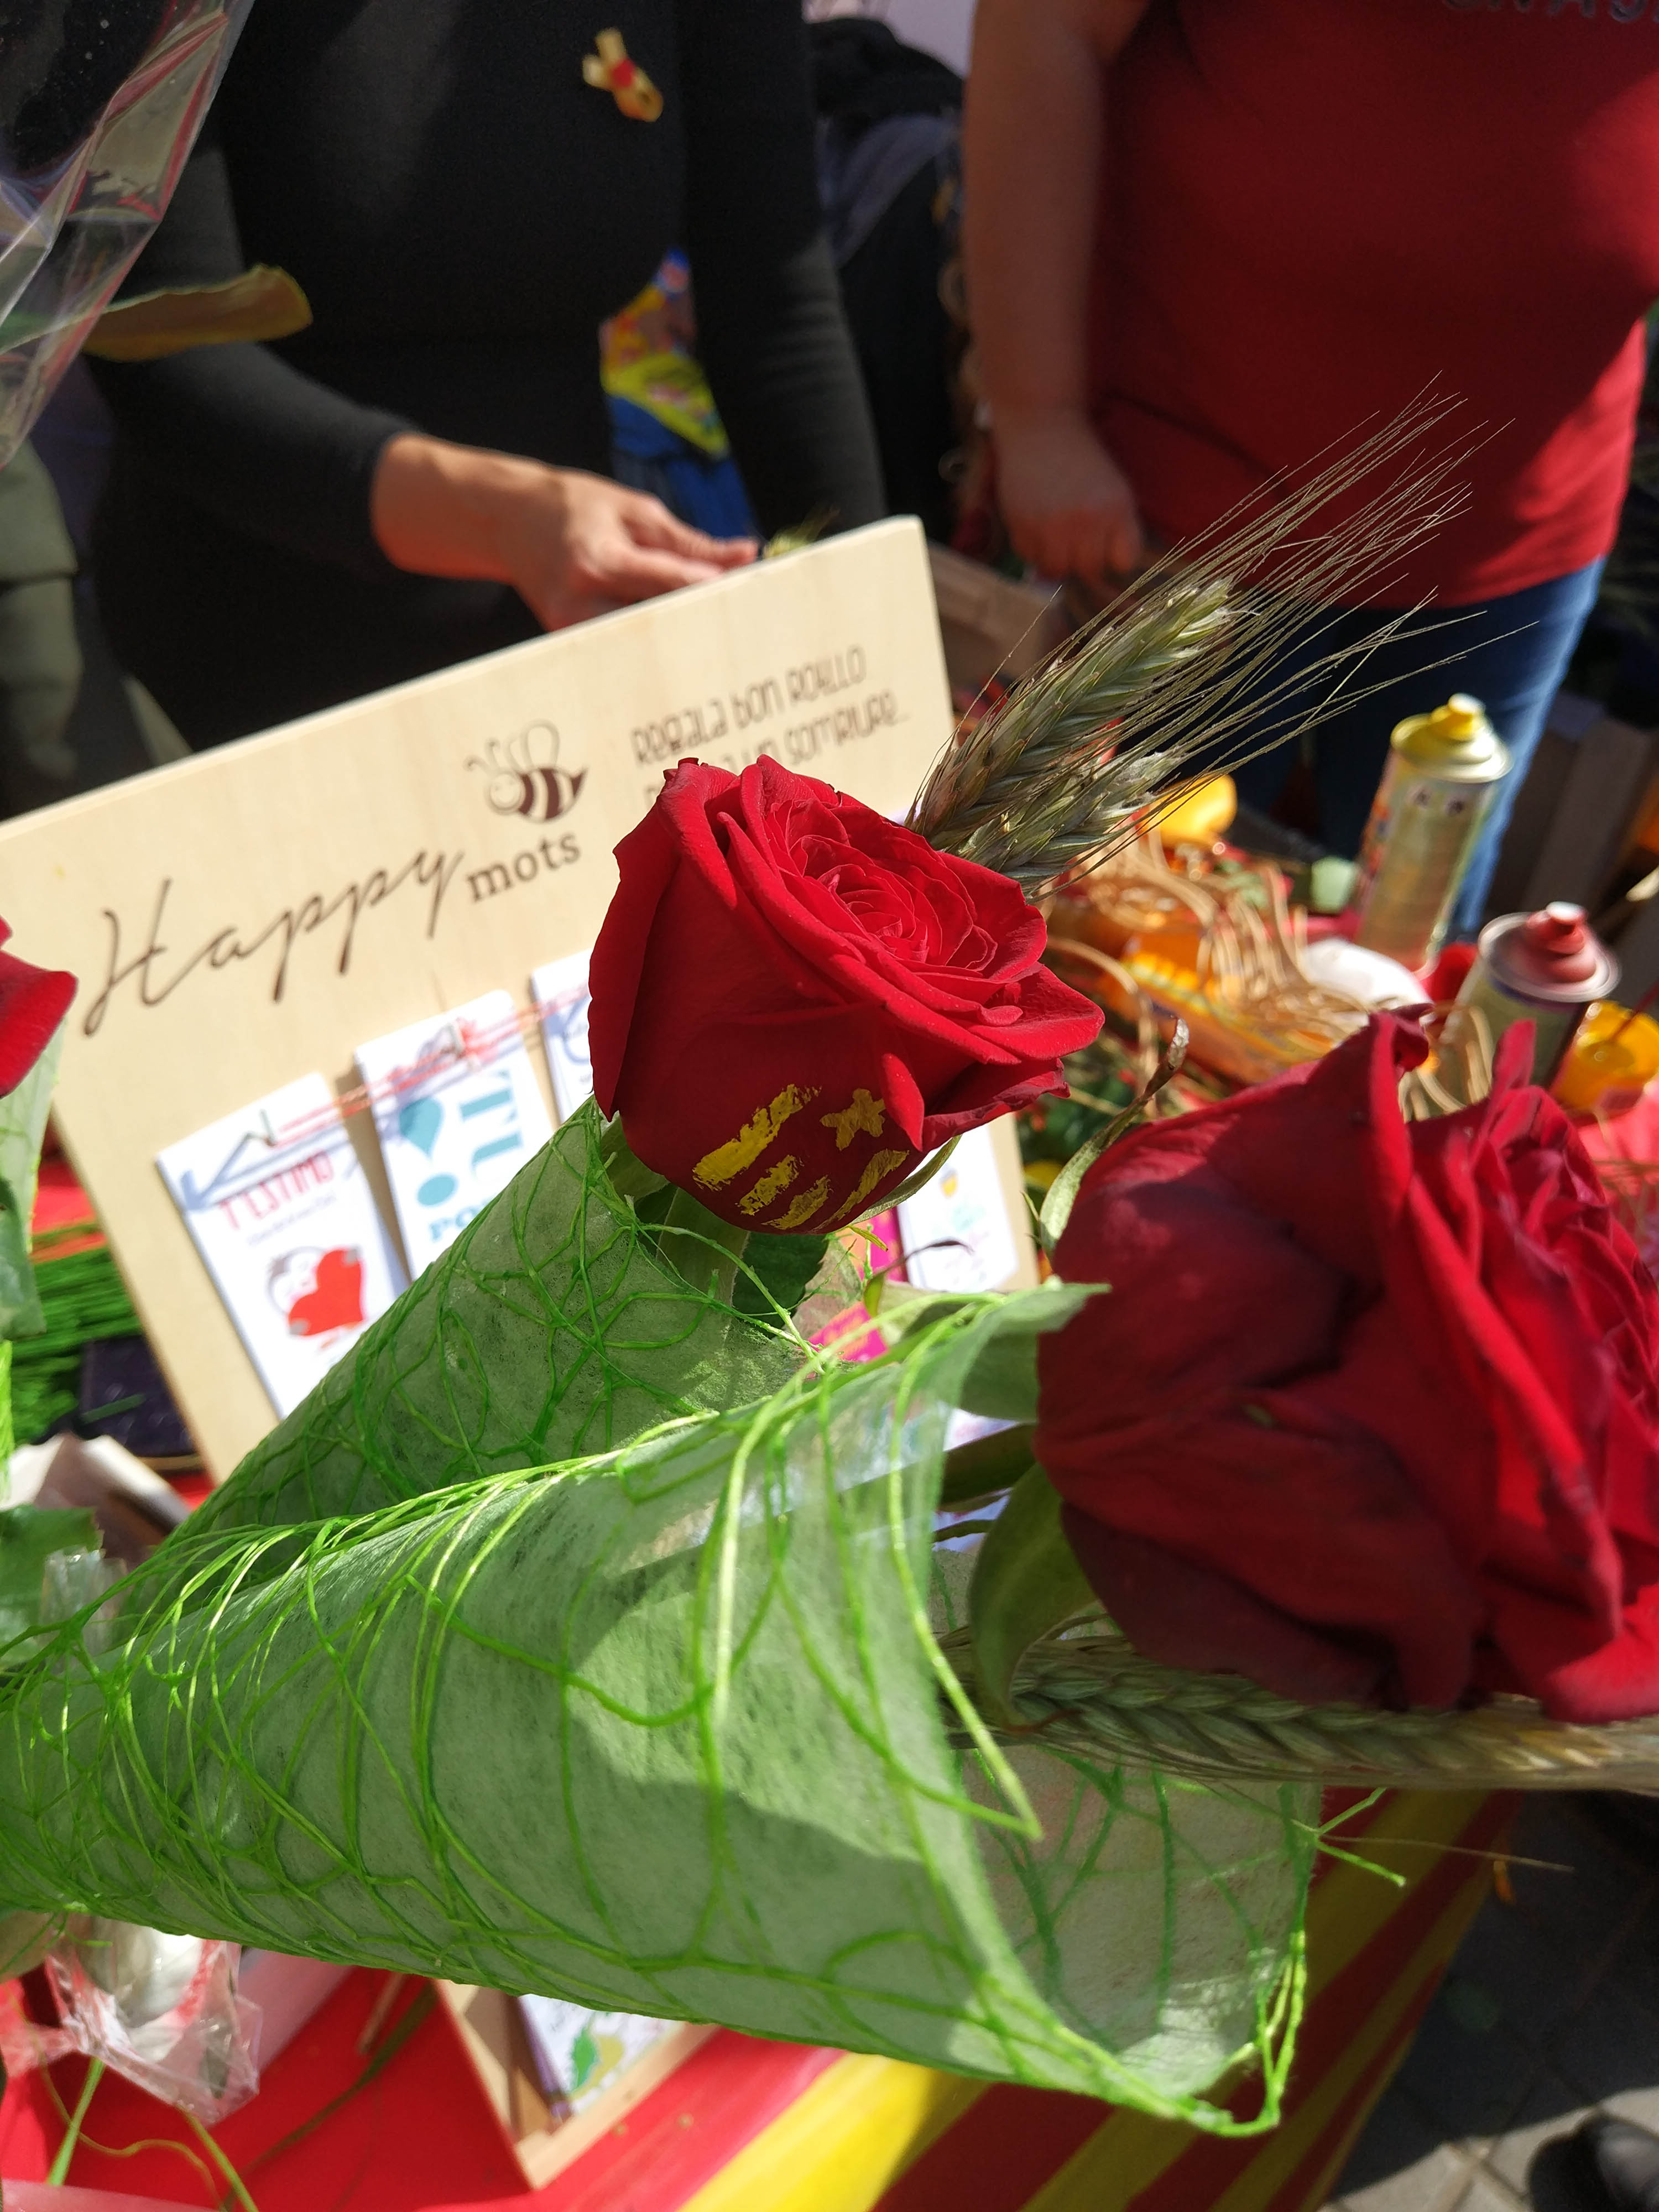 Sant Jordi Happy Mots